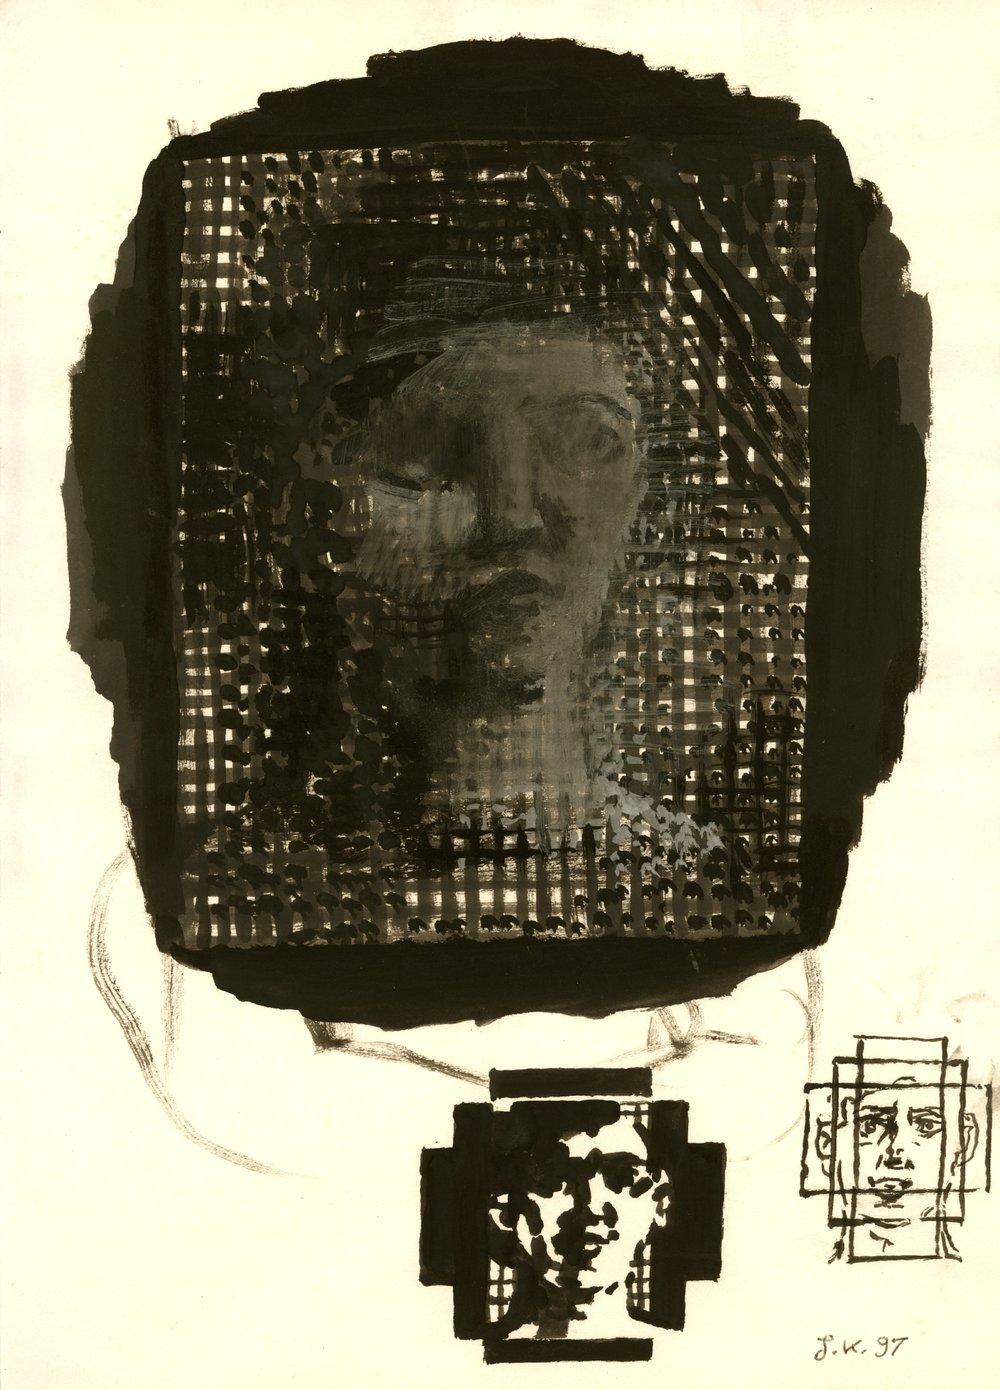 HEAD- 2003